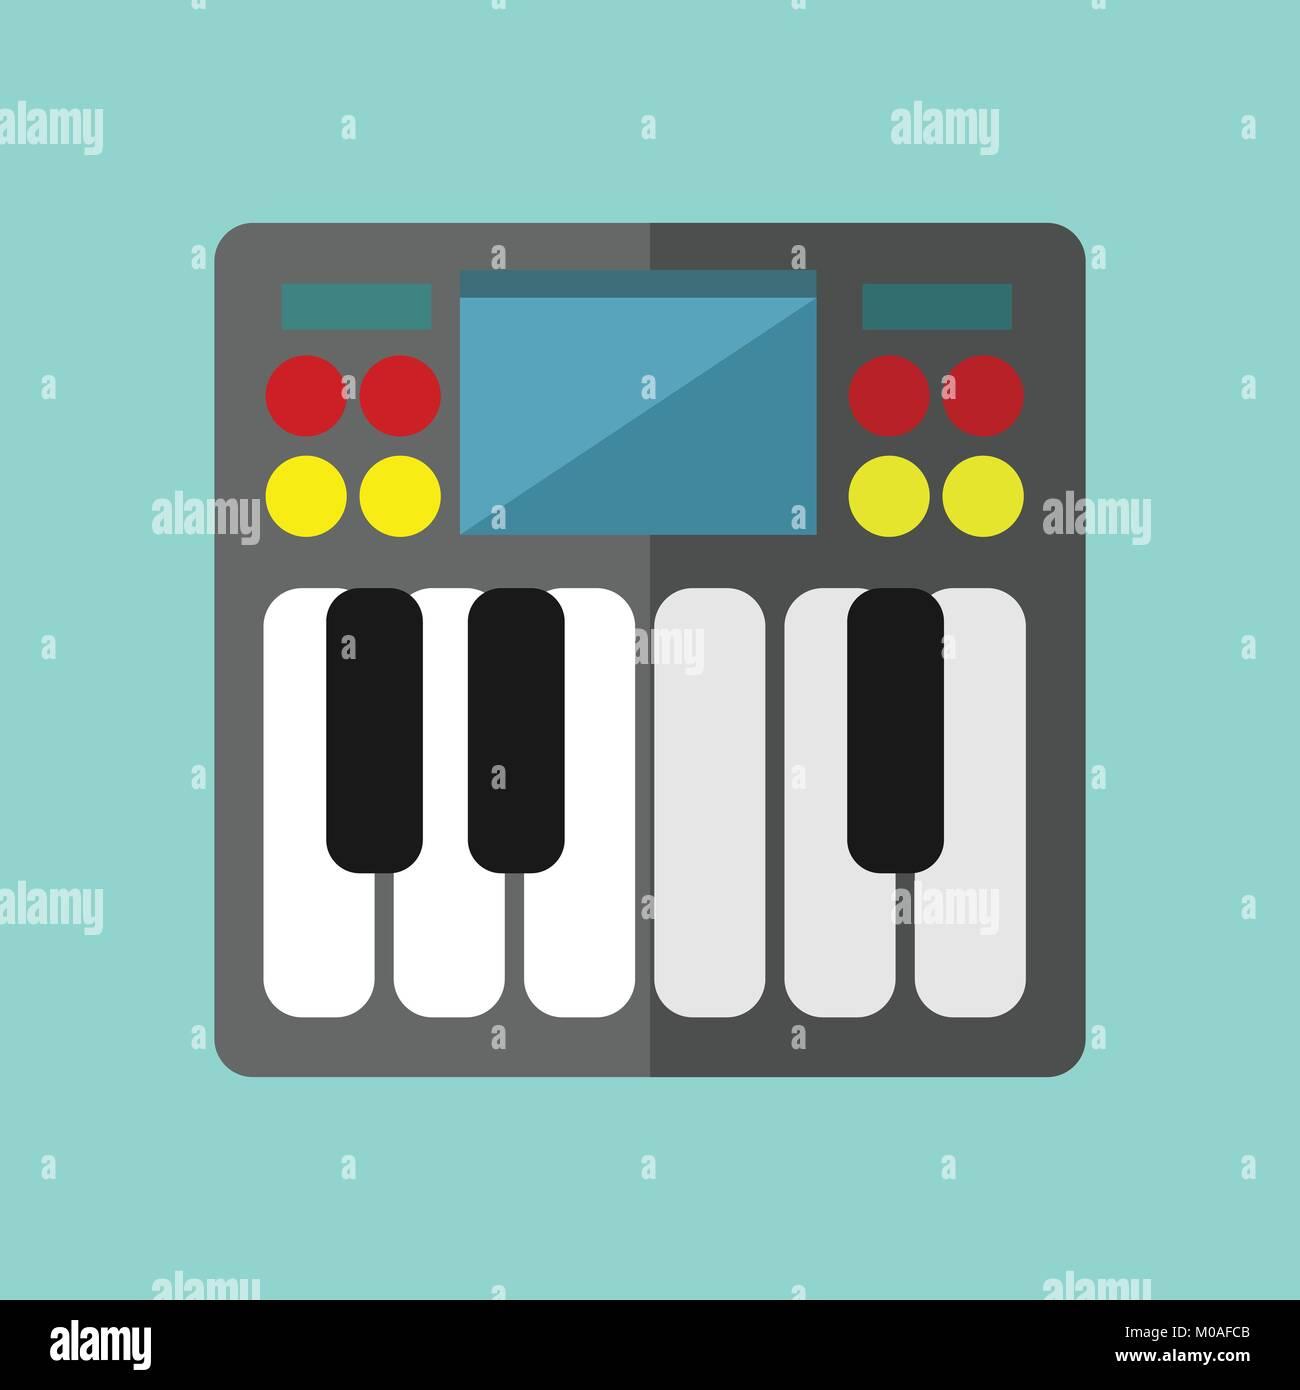 Mini Synthesizer Keyboard Vector Illustration Graphic Design - Stock Image